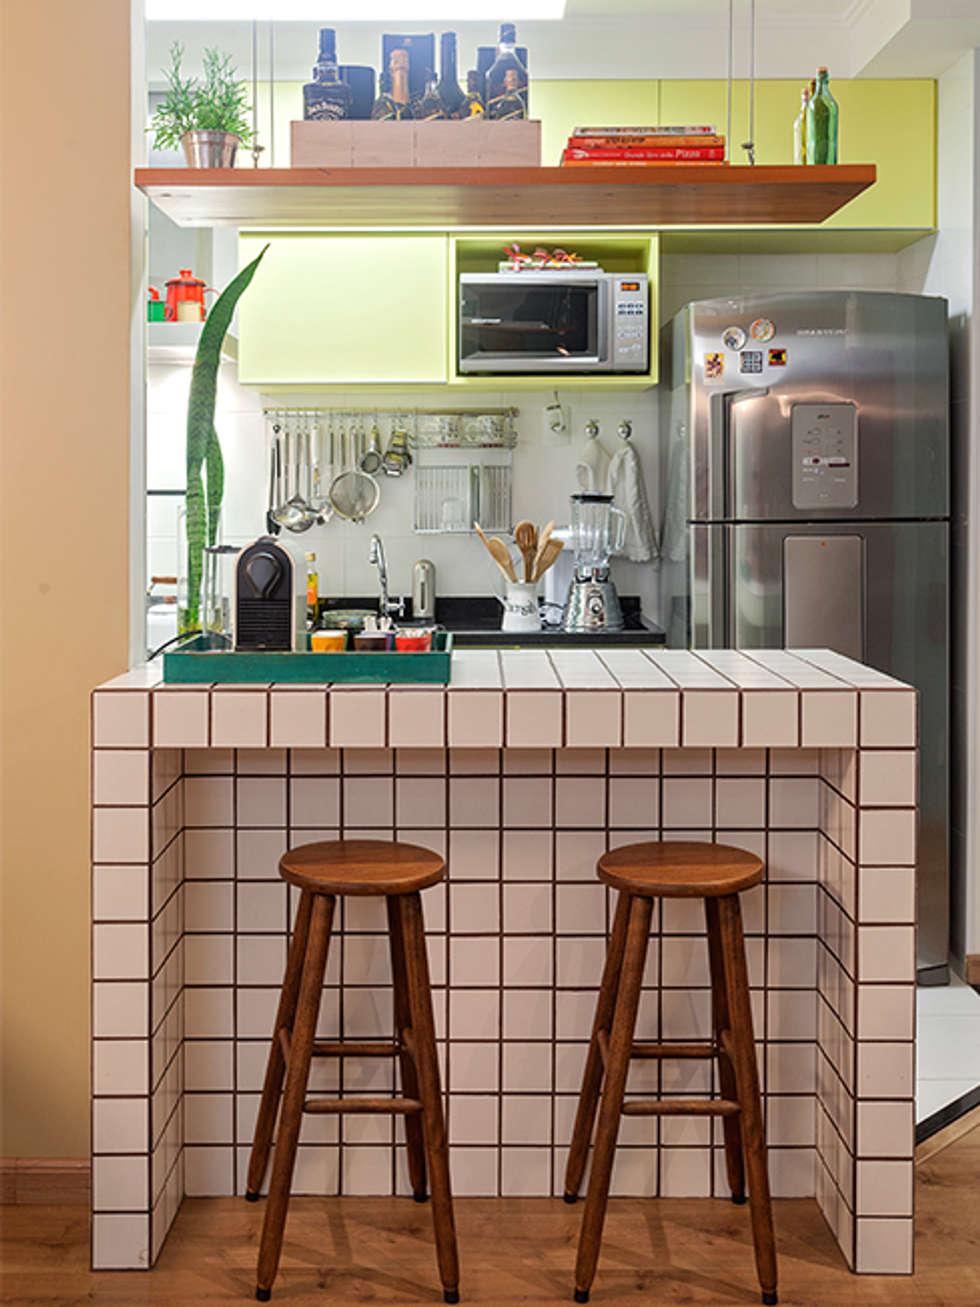 Fotos de decora o design de interiores e reformas homify for 241 maynard terrace